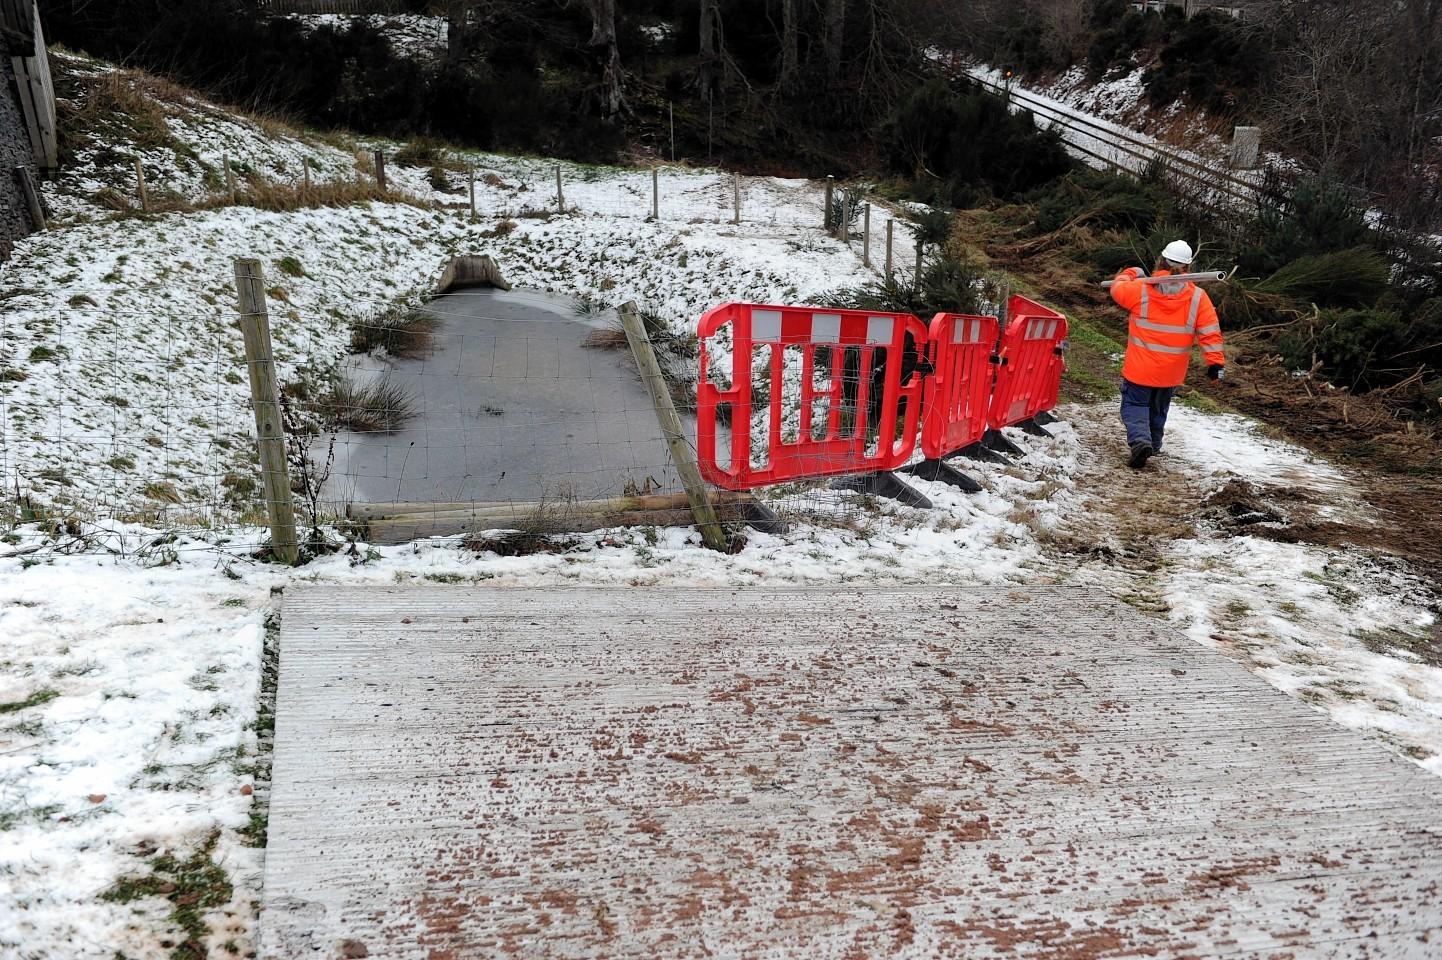 Work begins on the Smithton Burn